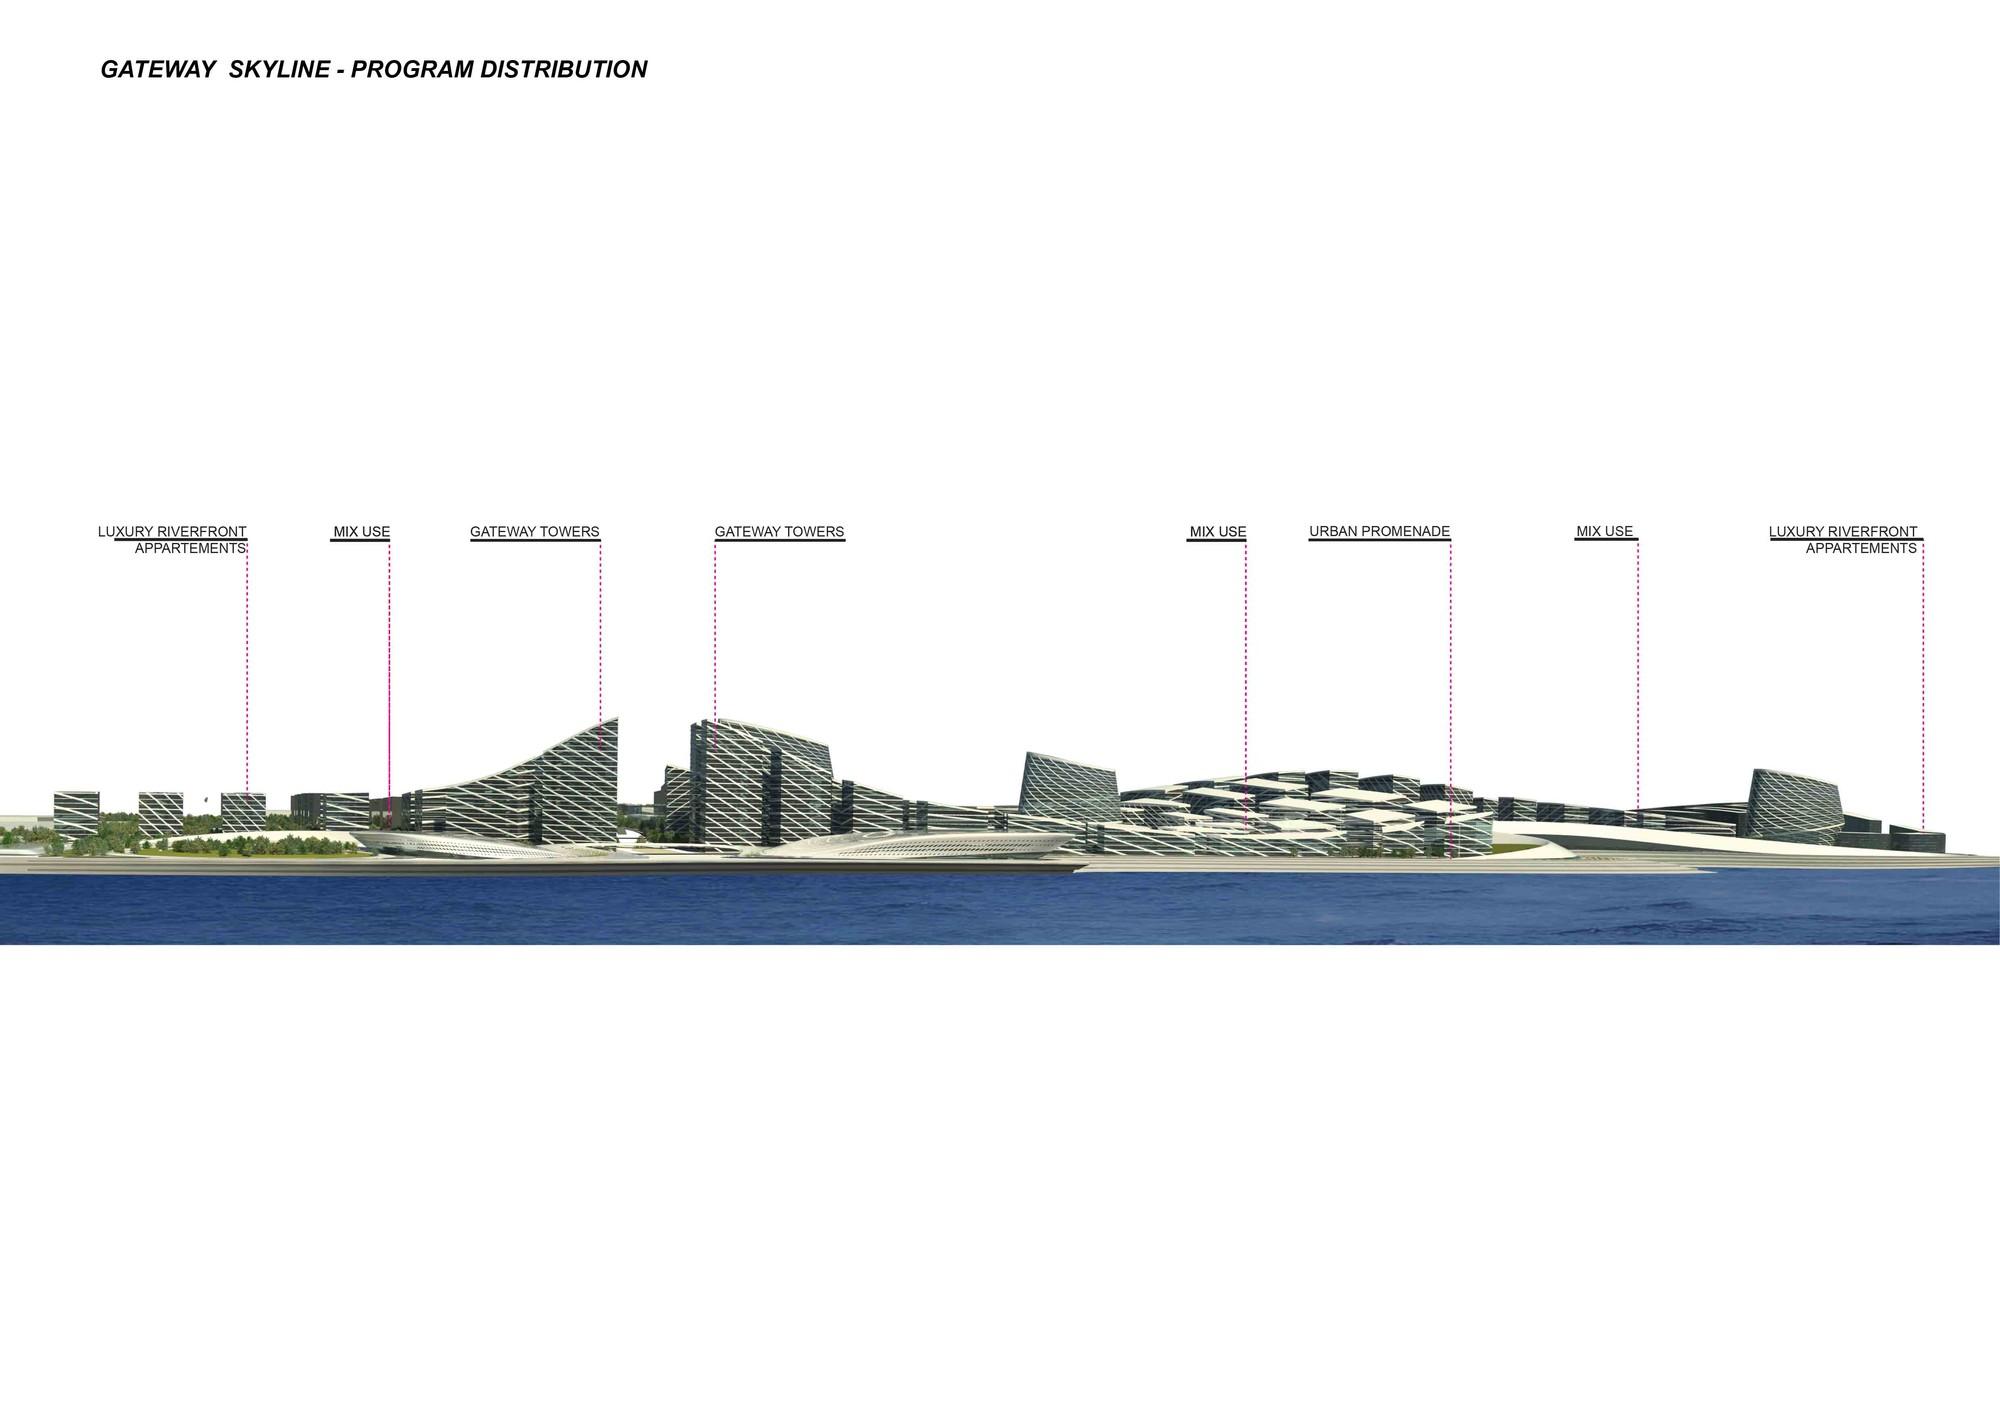 hight resolution of kanpur riverfront development proposal studio symbiosis gateway skyline program distribution diagram 03